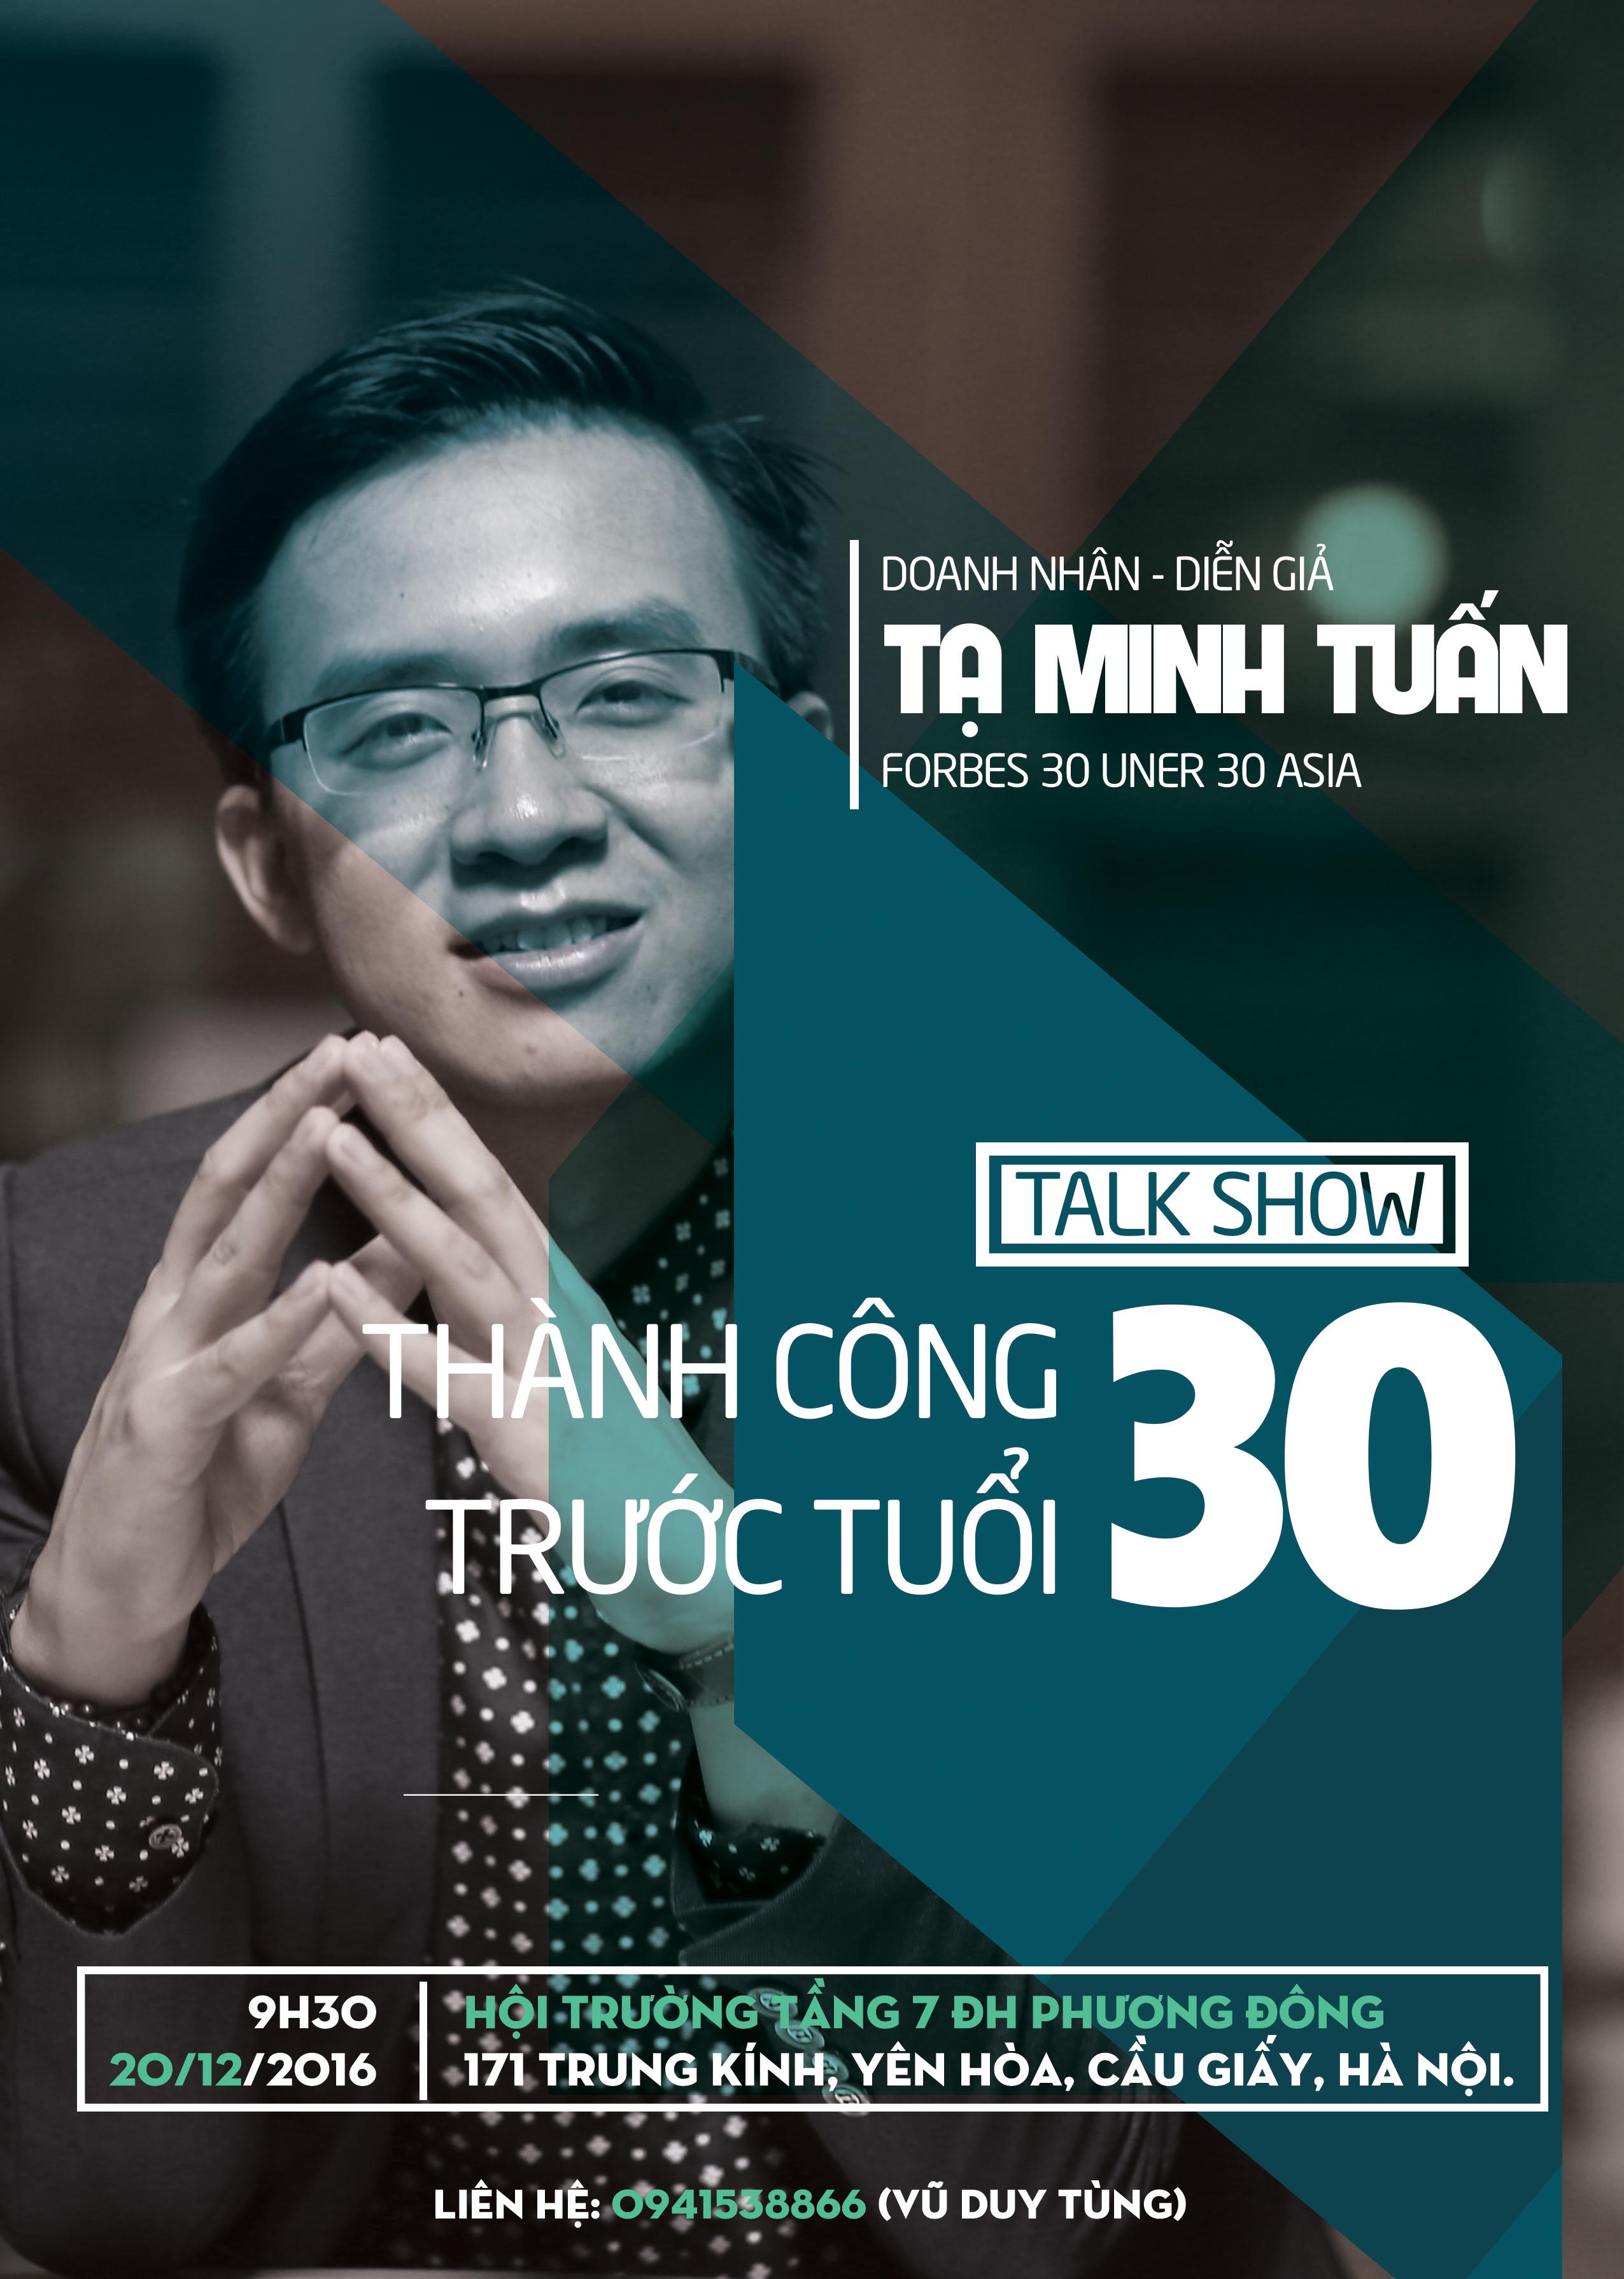 success before 30 talk show